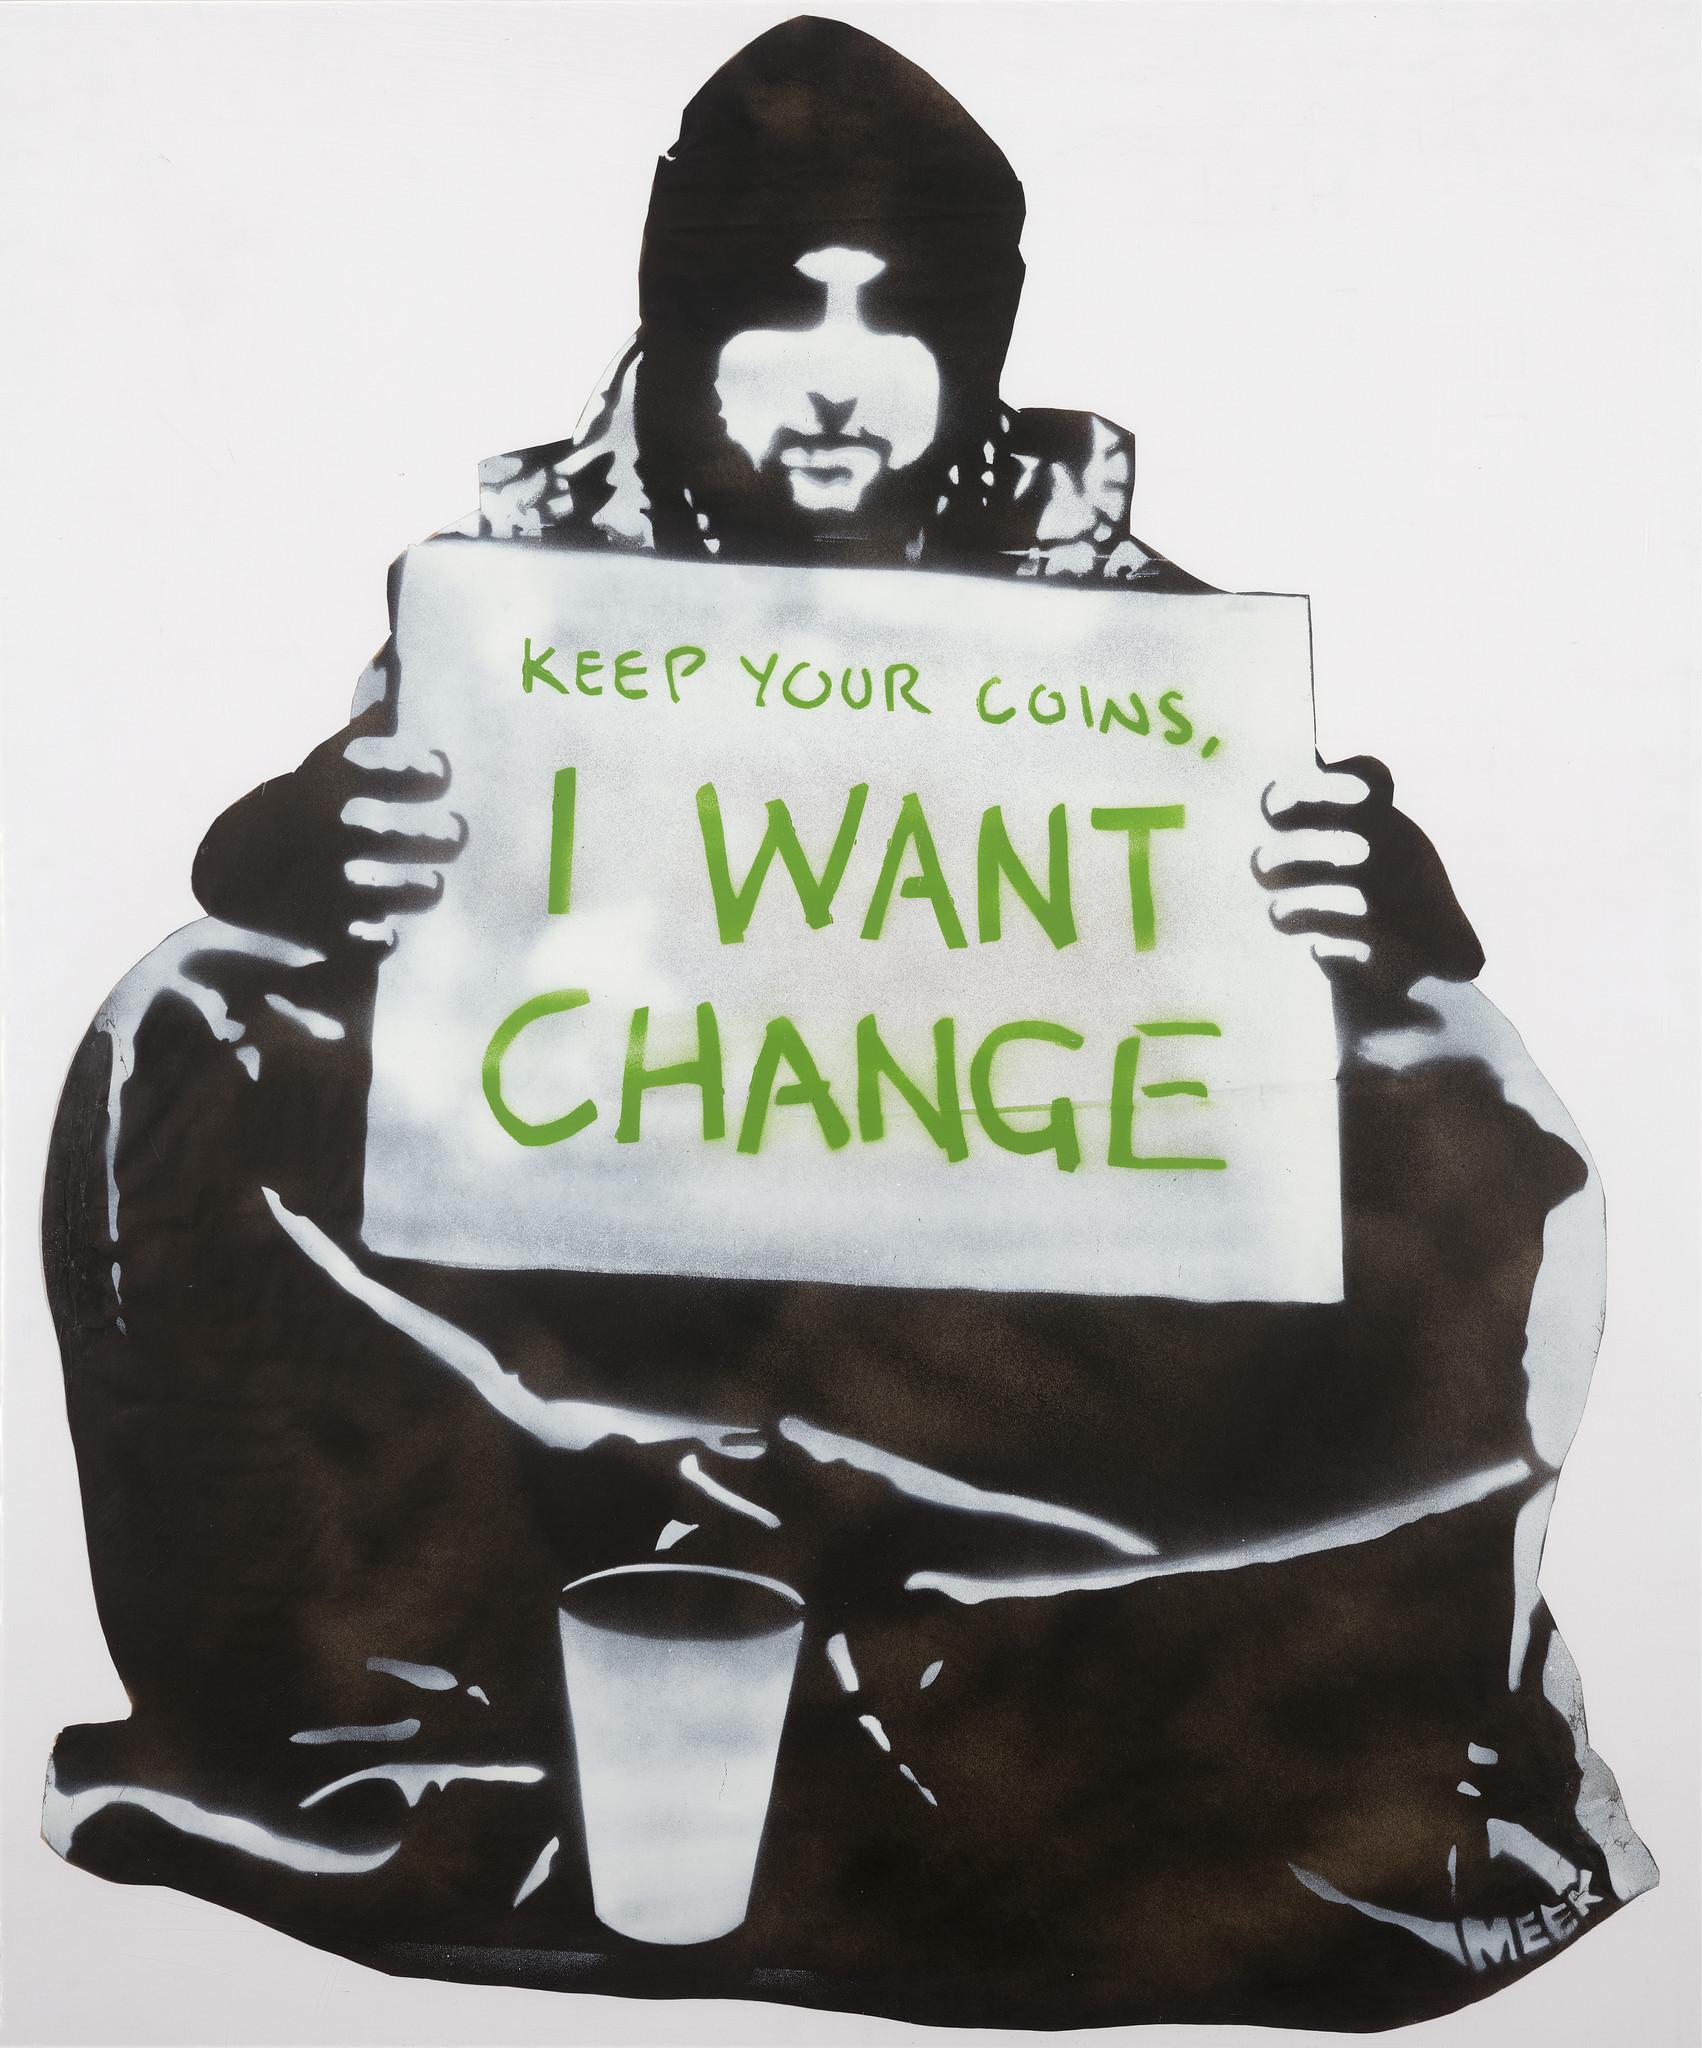 """Begging for Change,"" Meek, stencil, 2004, Melbourne, Australia."